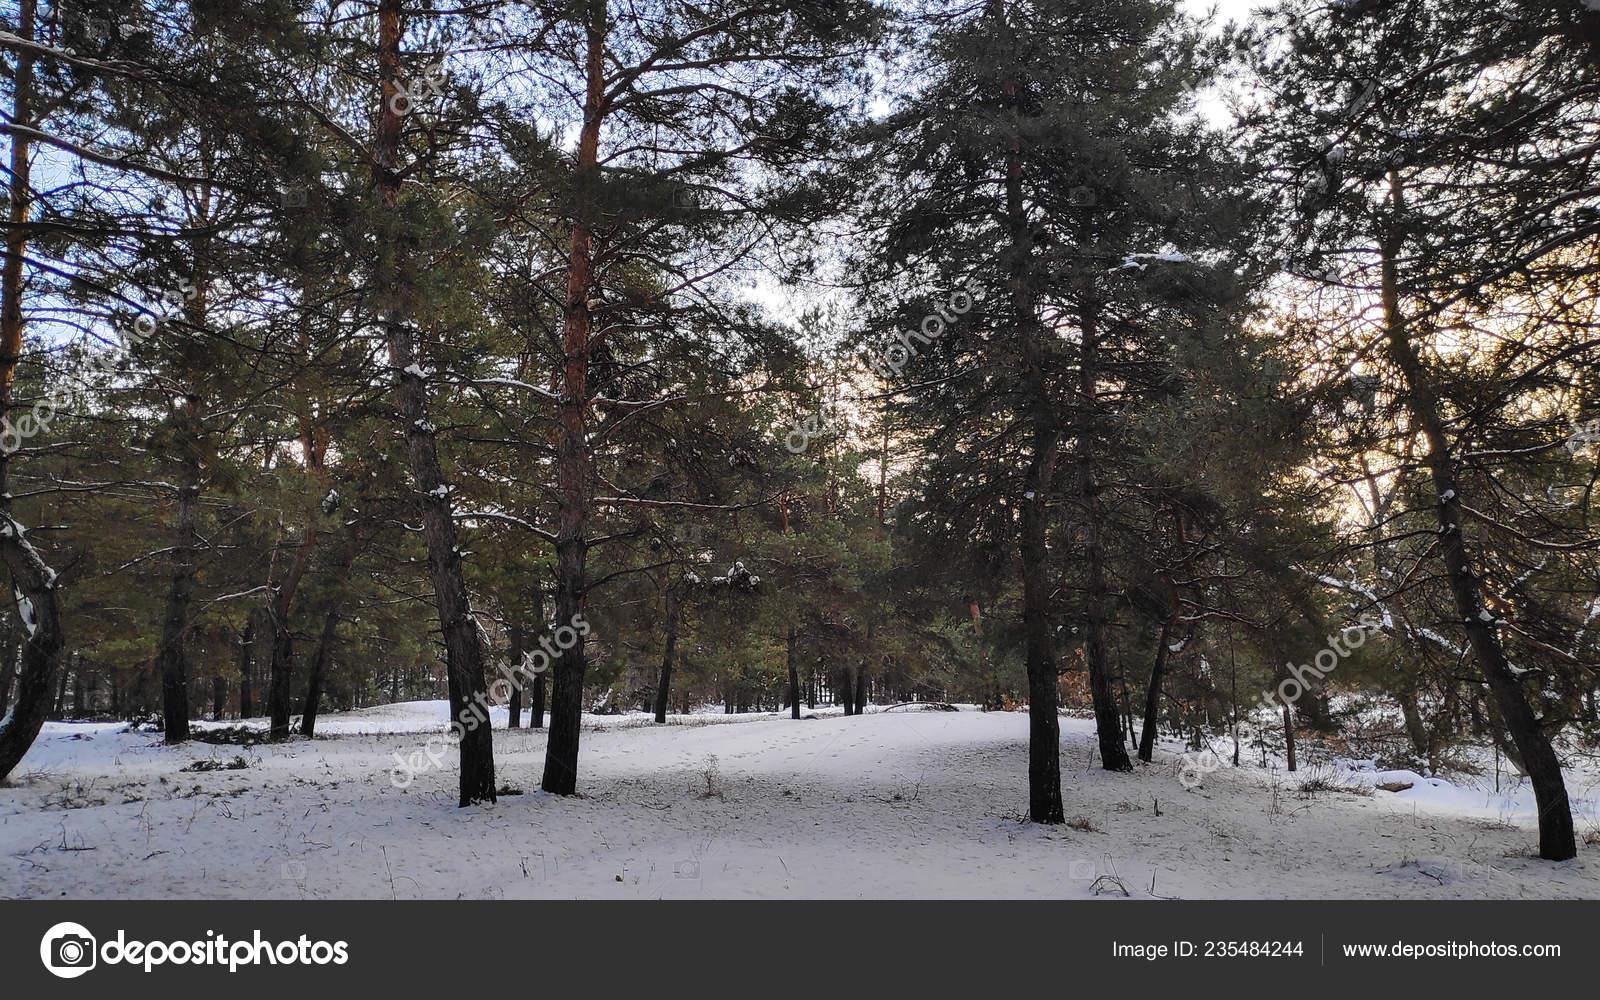 Paysage Forêt Hiver Beaucoup Neige Dans Forêt Arbres Dans Neige —  Photographie fotolubitel2017 © #235484244